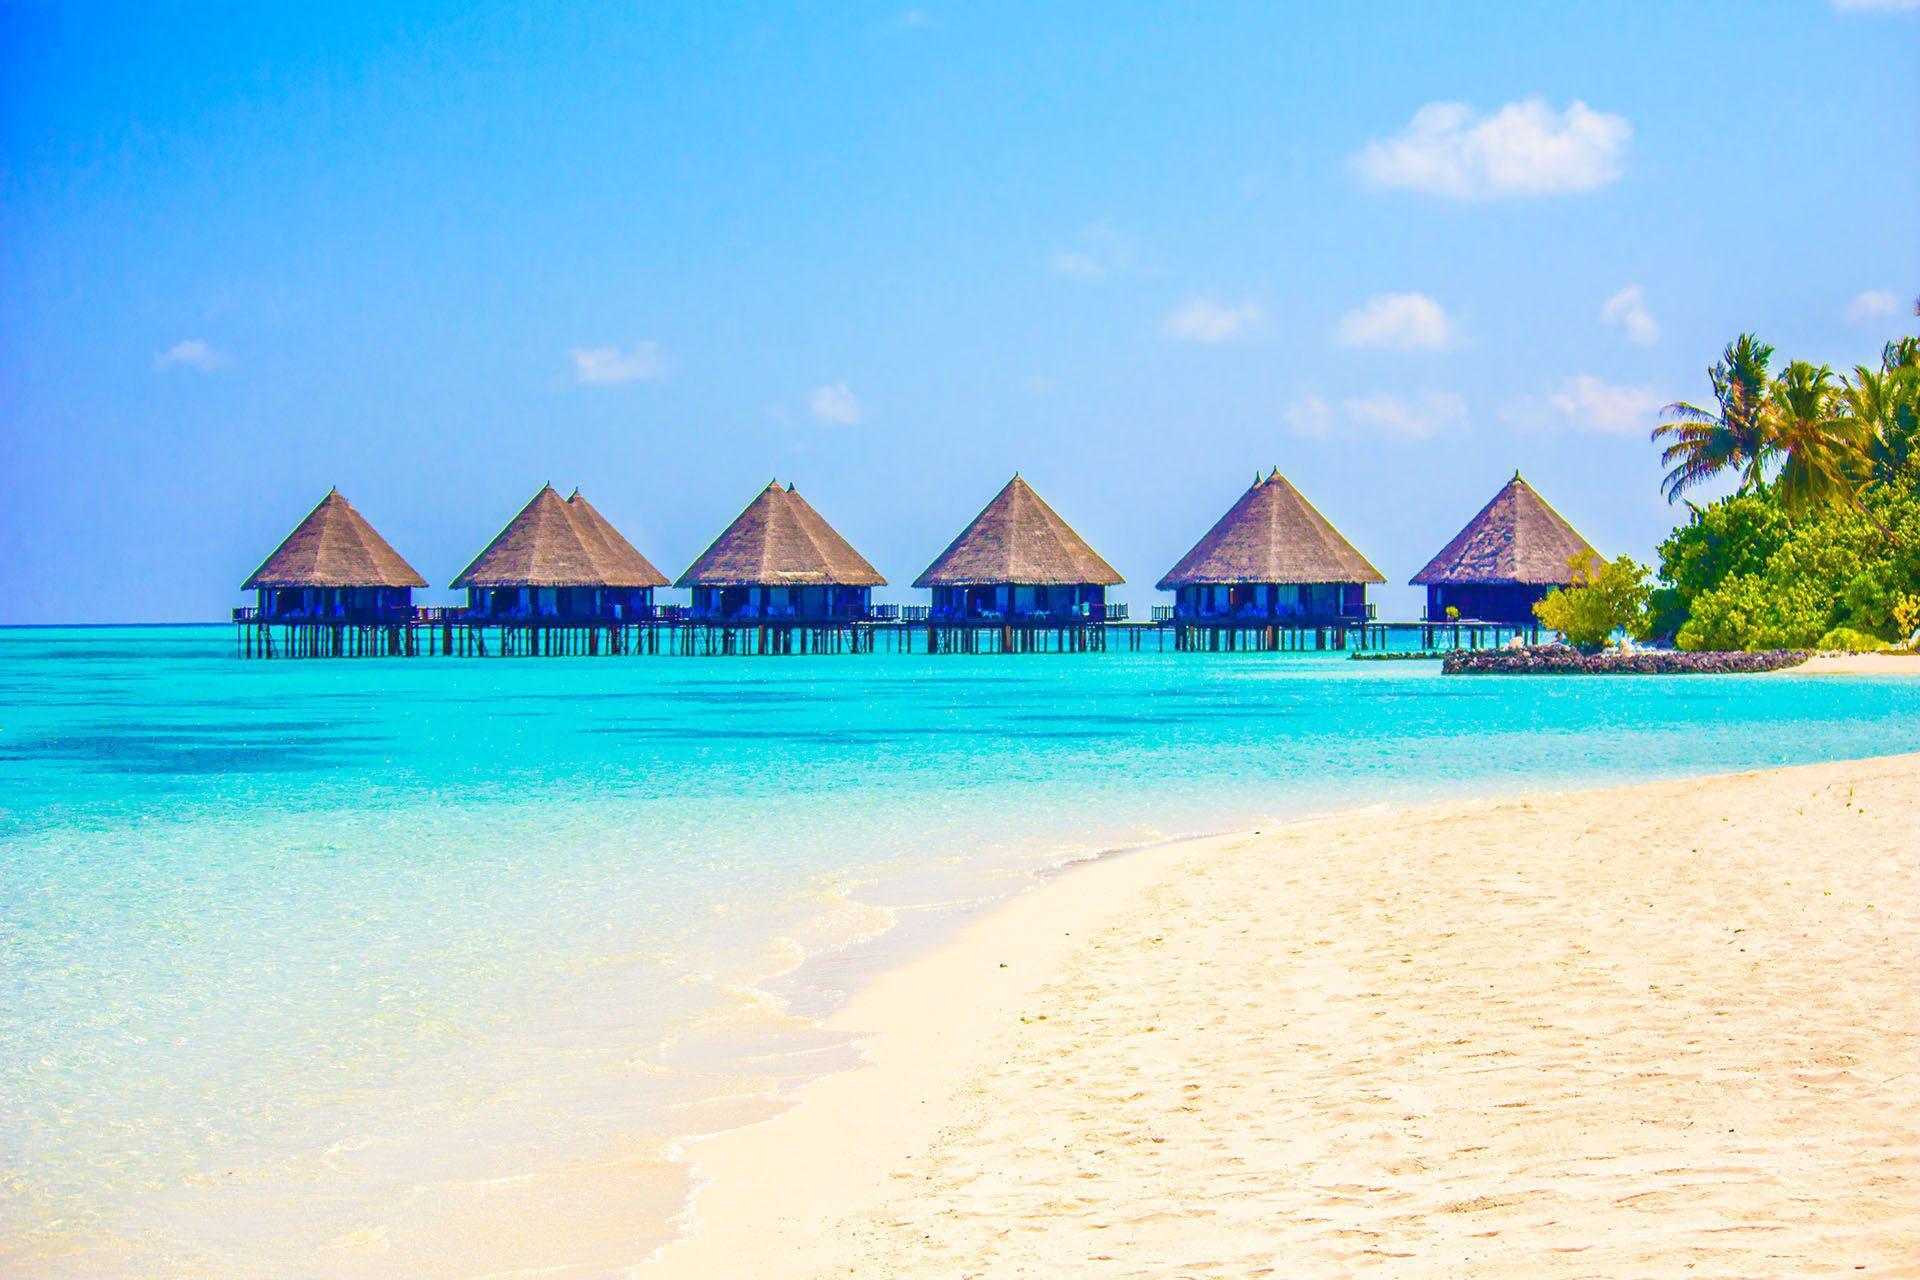 Voyage gay de Papeete (Tahiti)